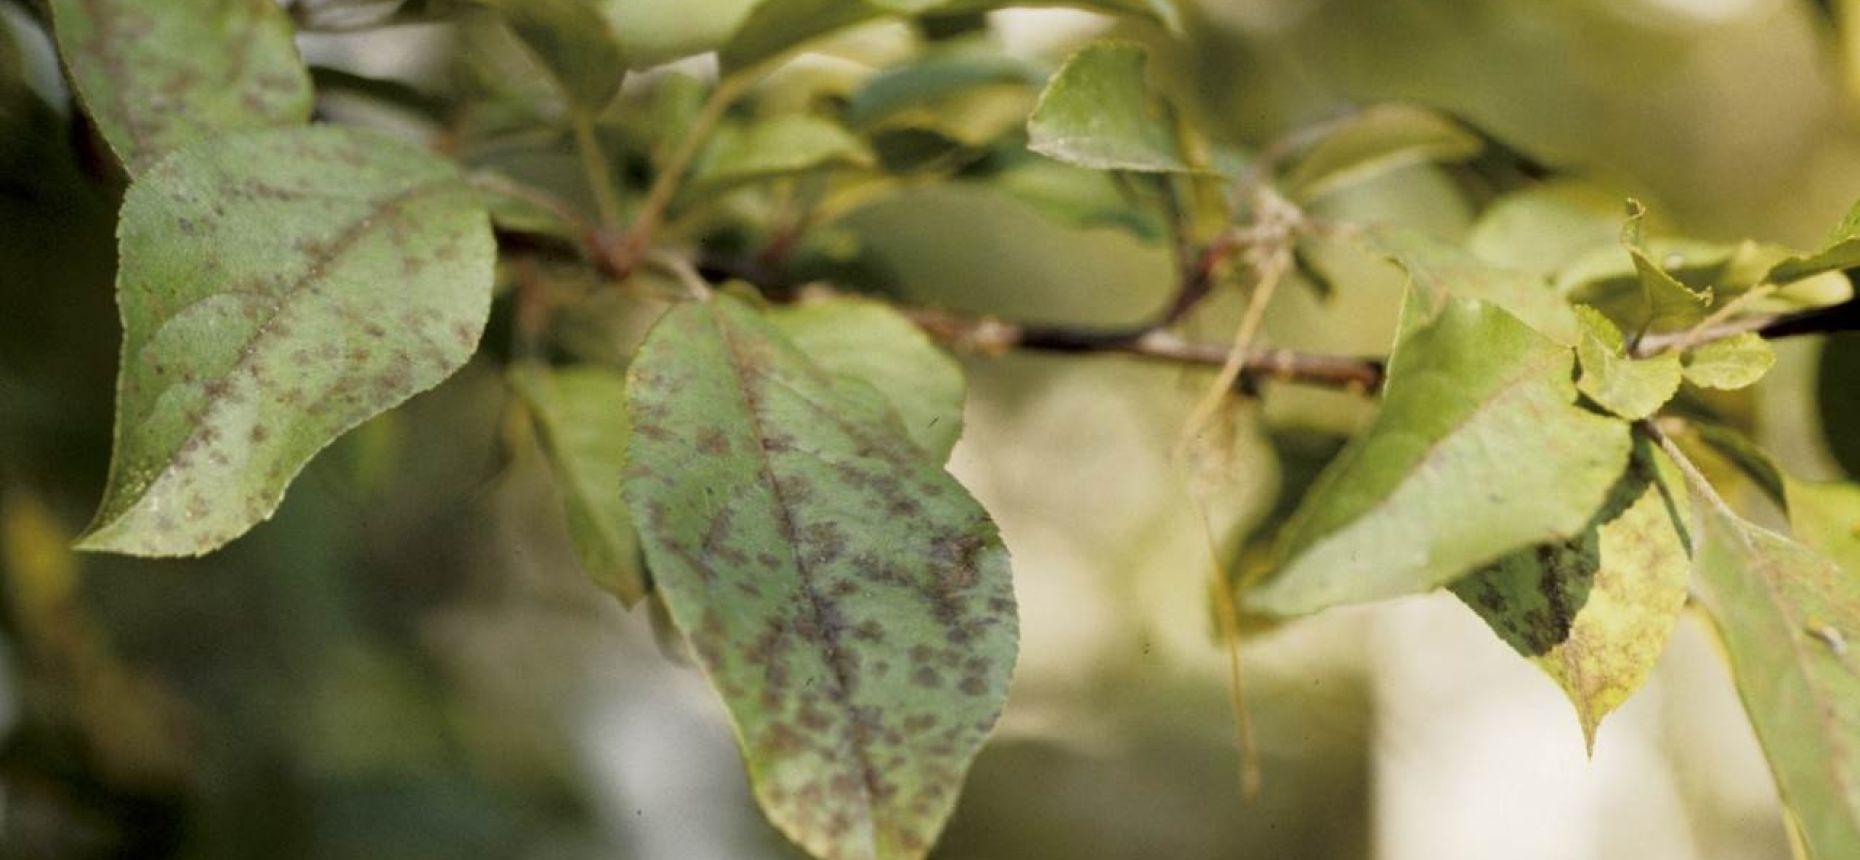 Парша яблони - Venturia inaegualis (анаморфа - Fusicladium dendriticum)